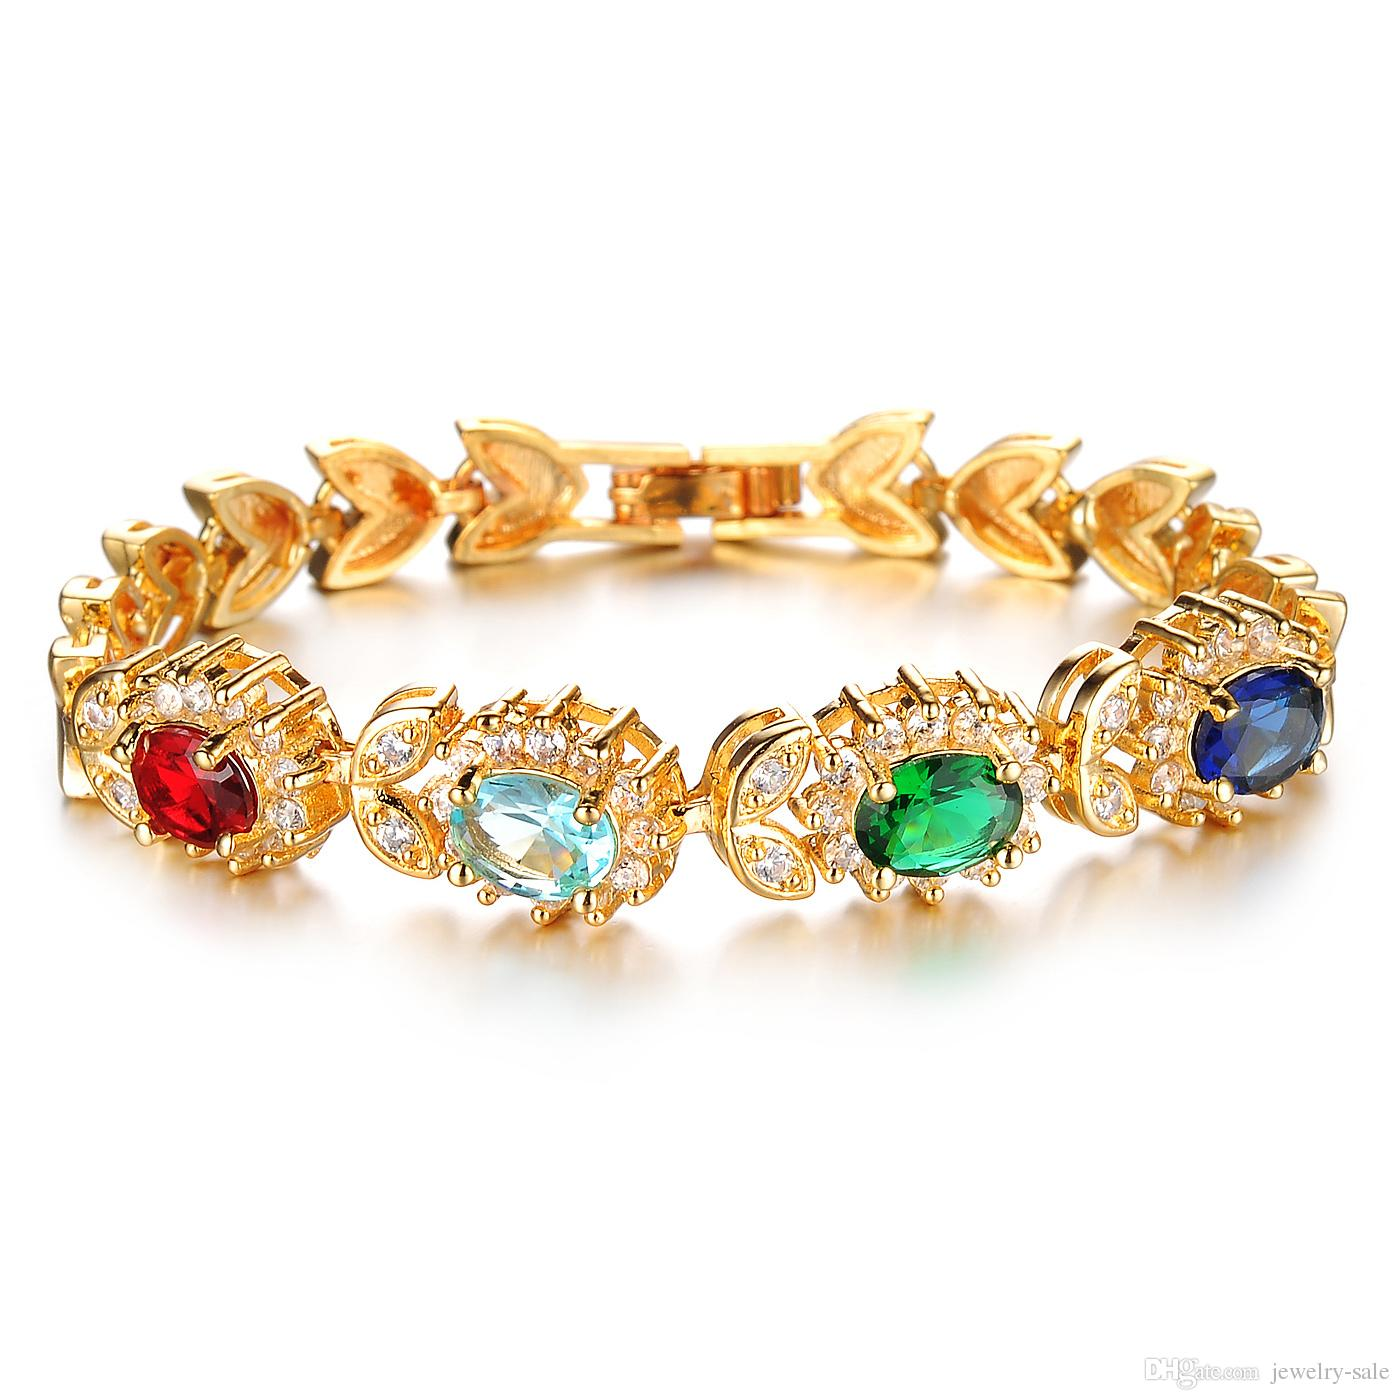 Fashion 18k Yellow Gold Bracelets For Women Wedding Bracelet With Cz Zircon  Crystal Free Shipping 439